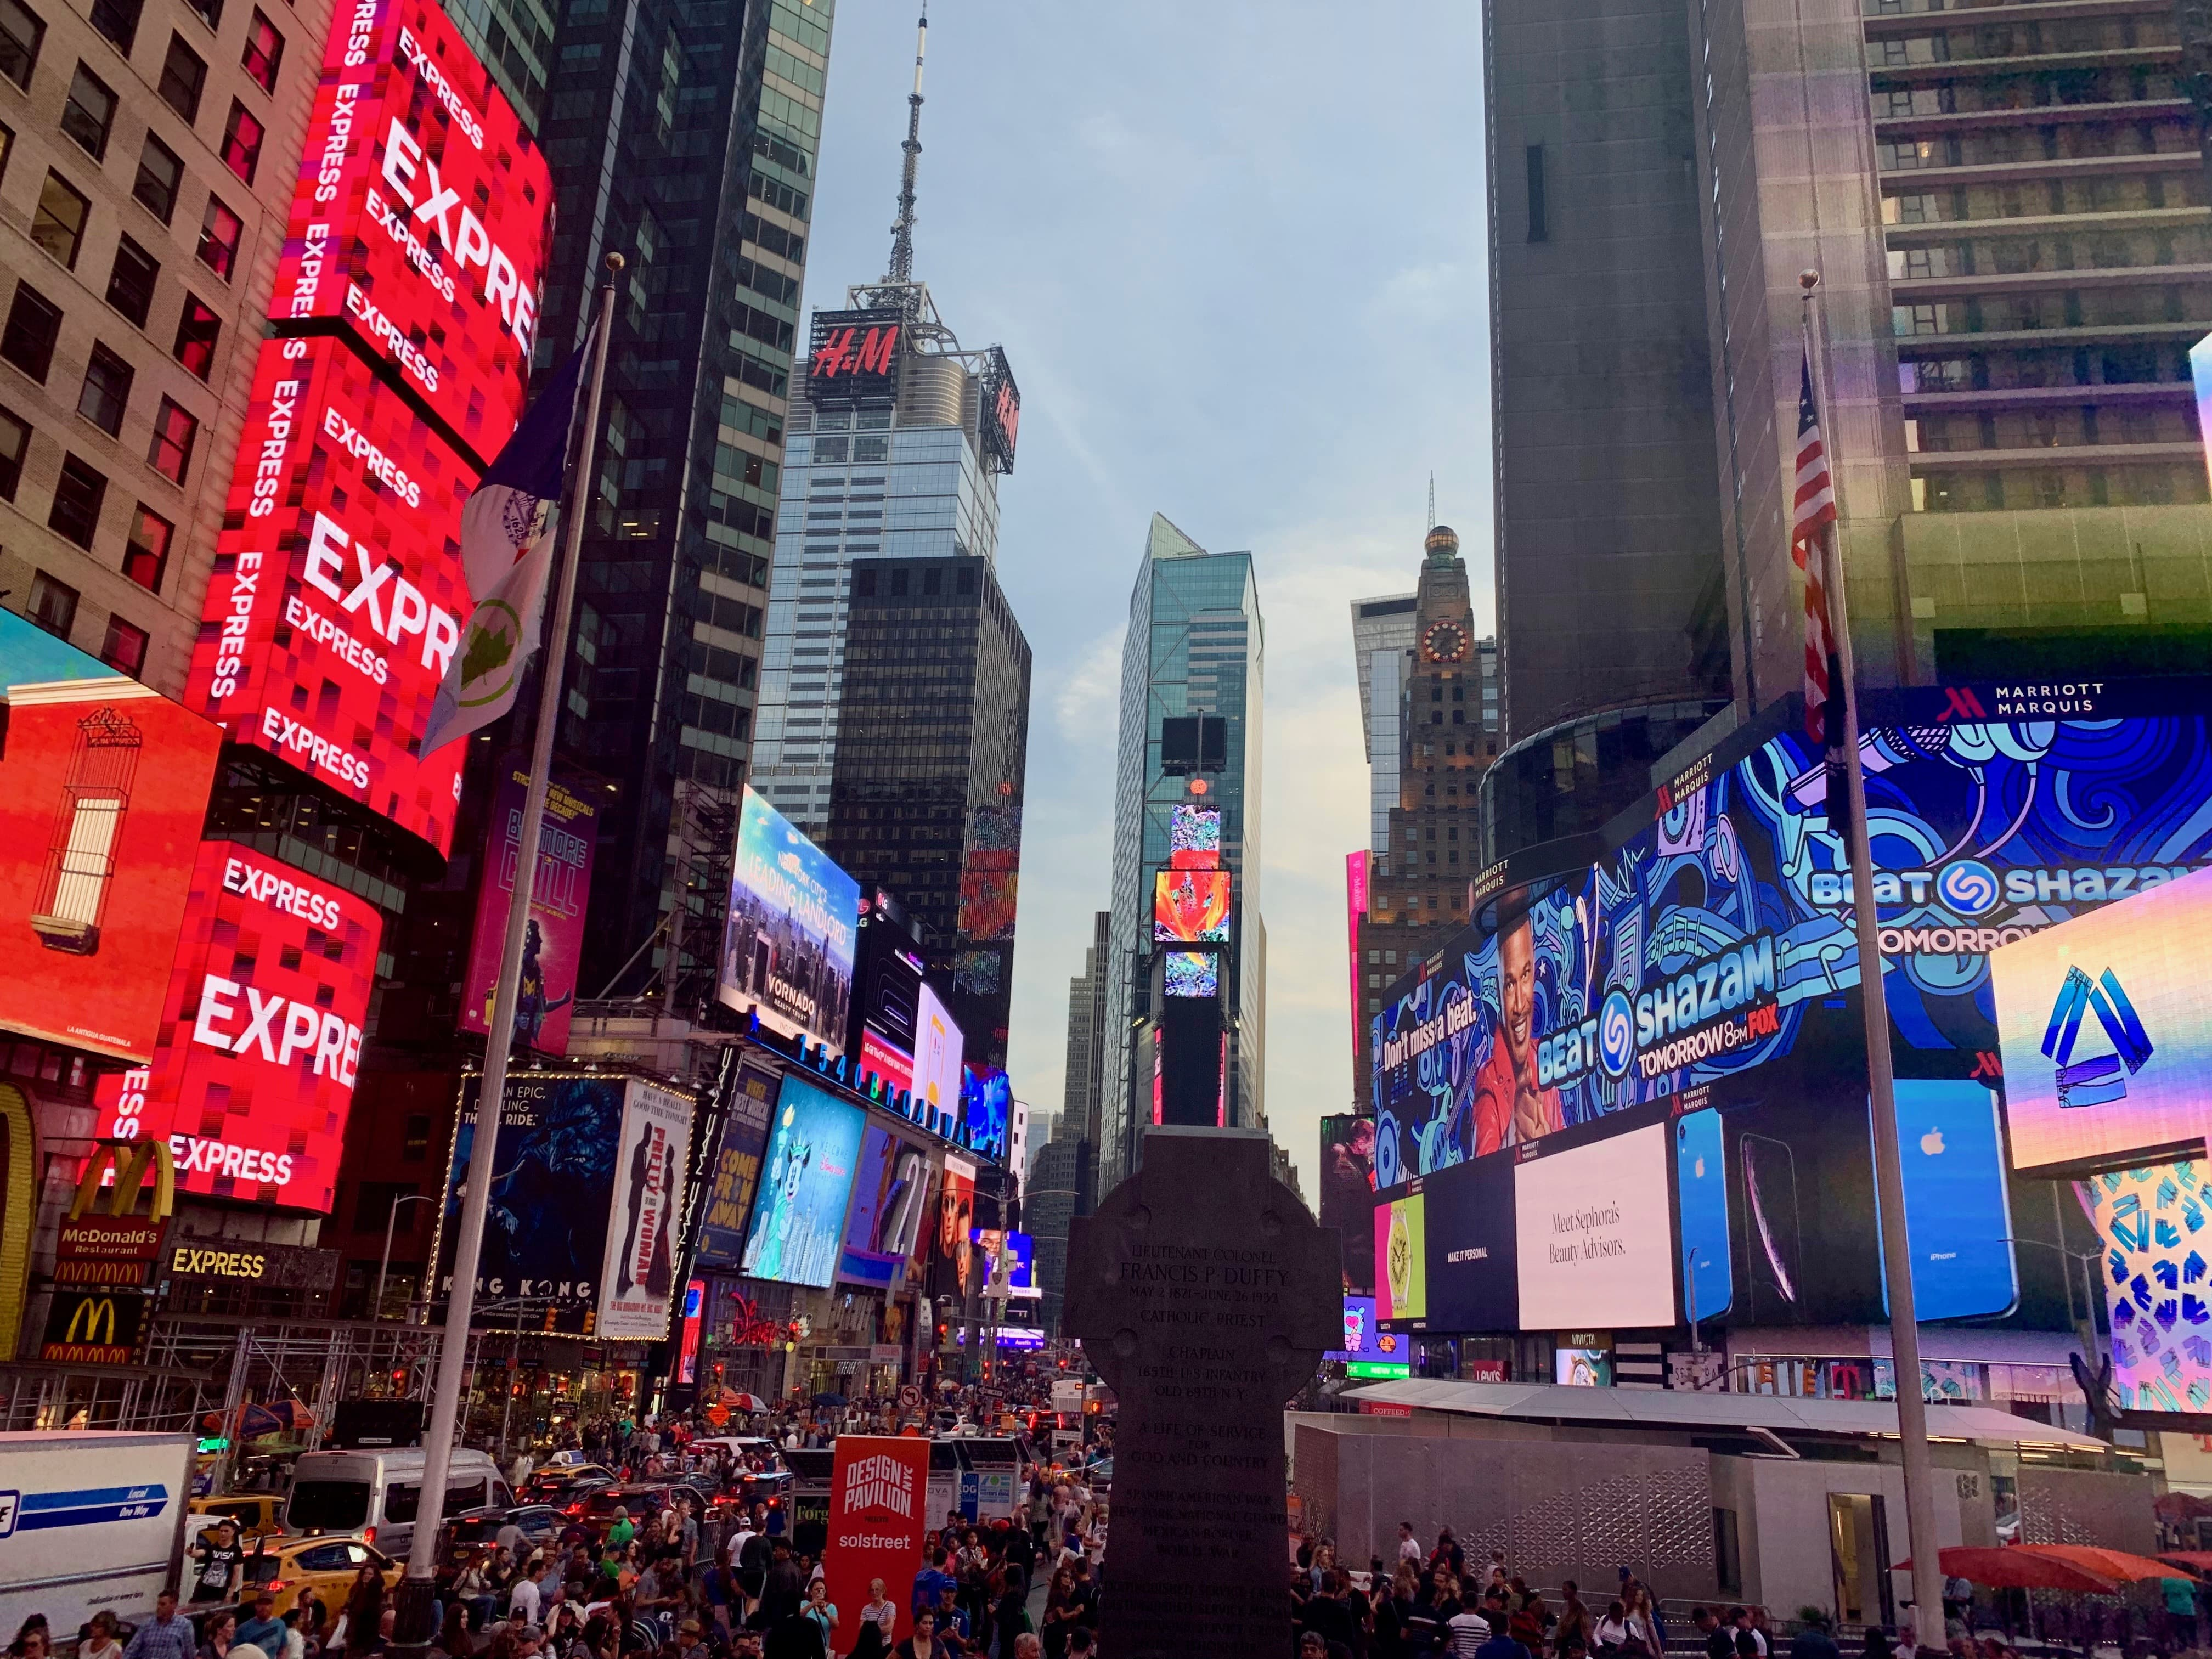 Times Square en fin de soiree